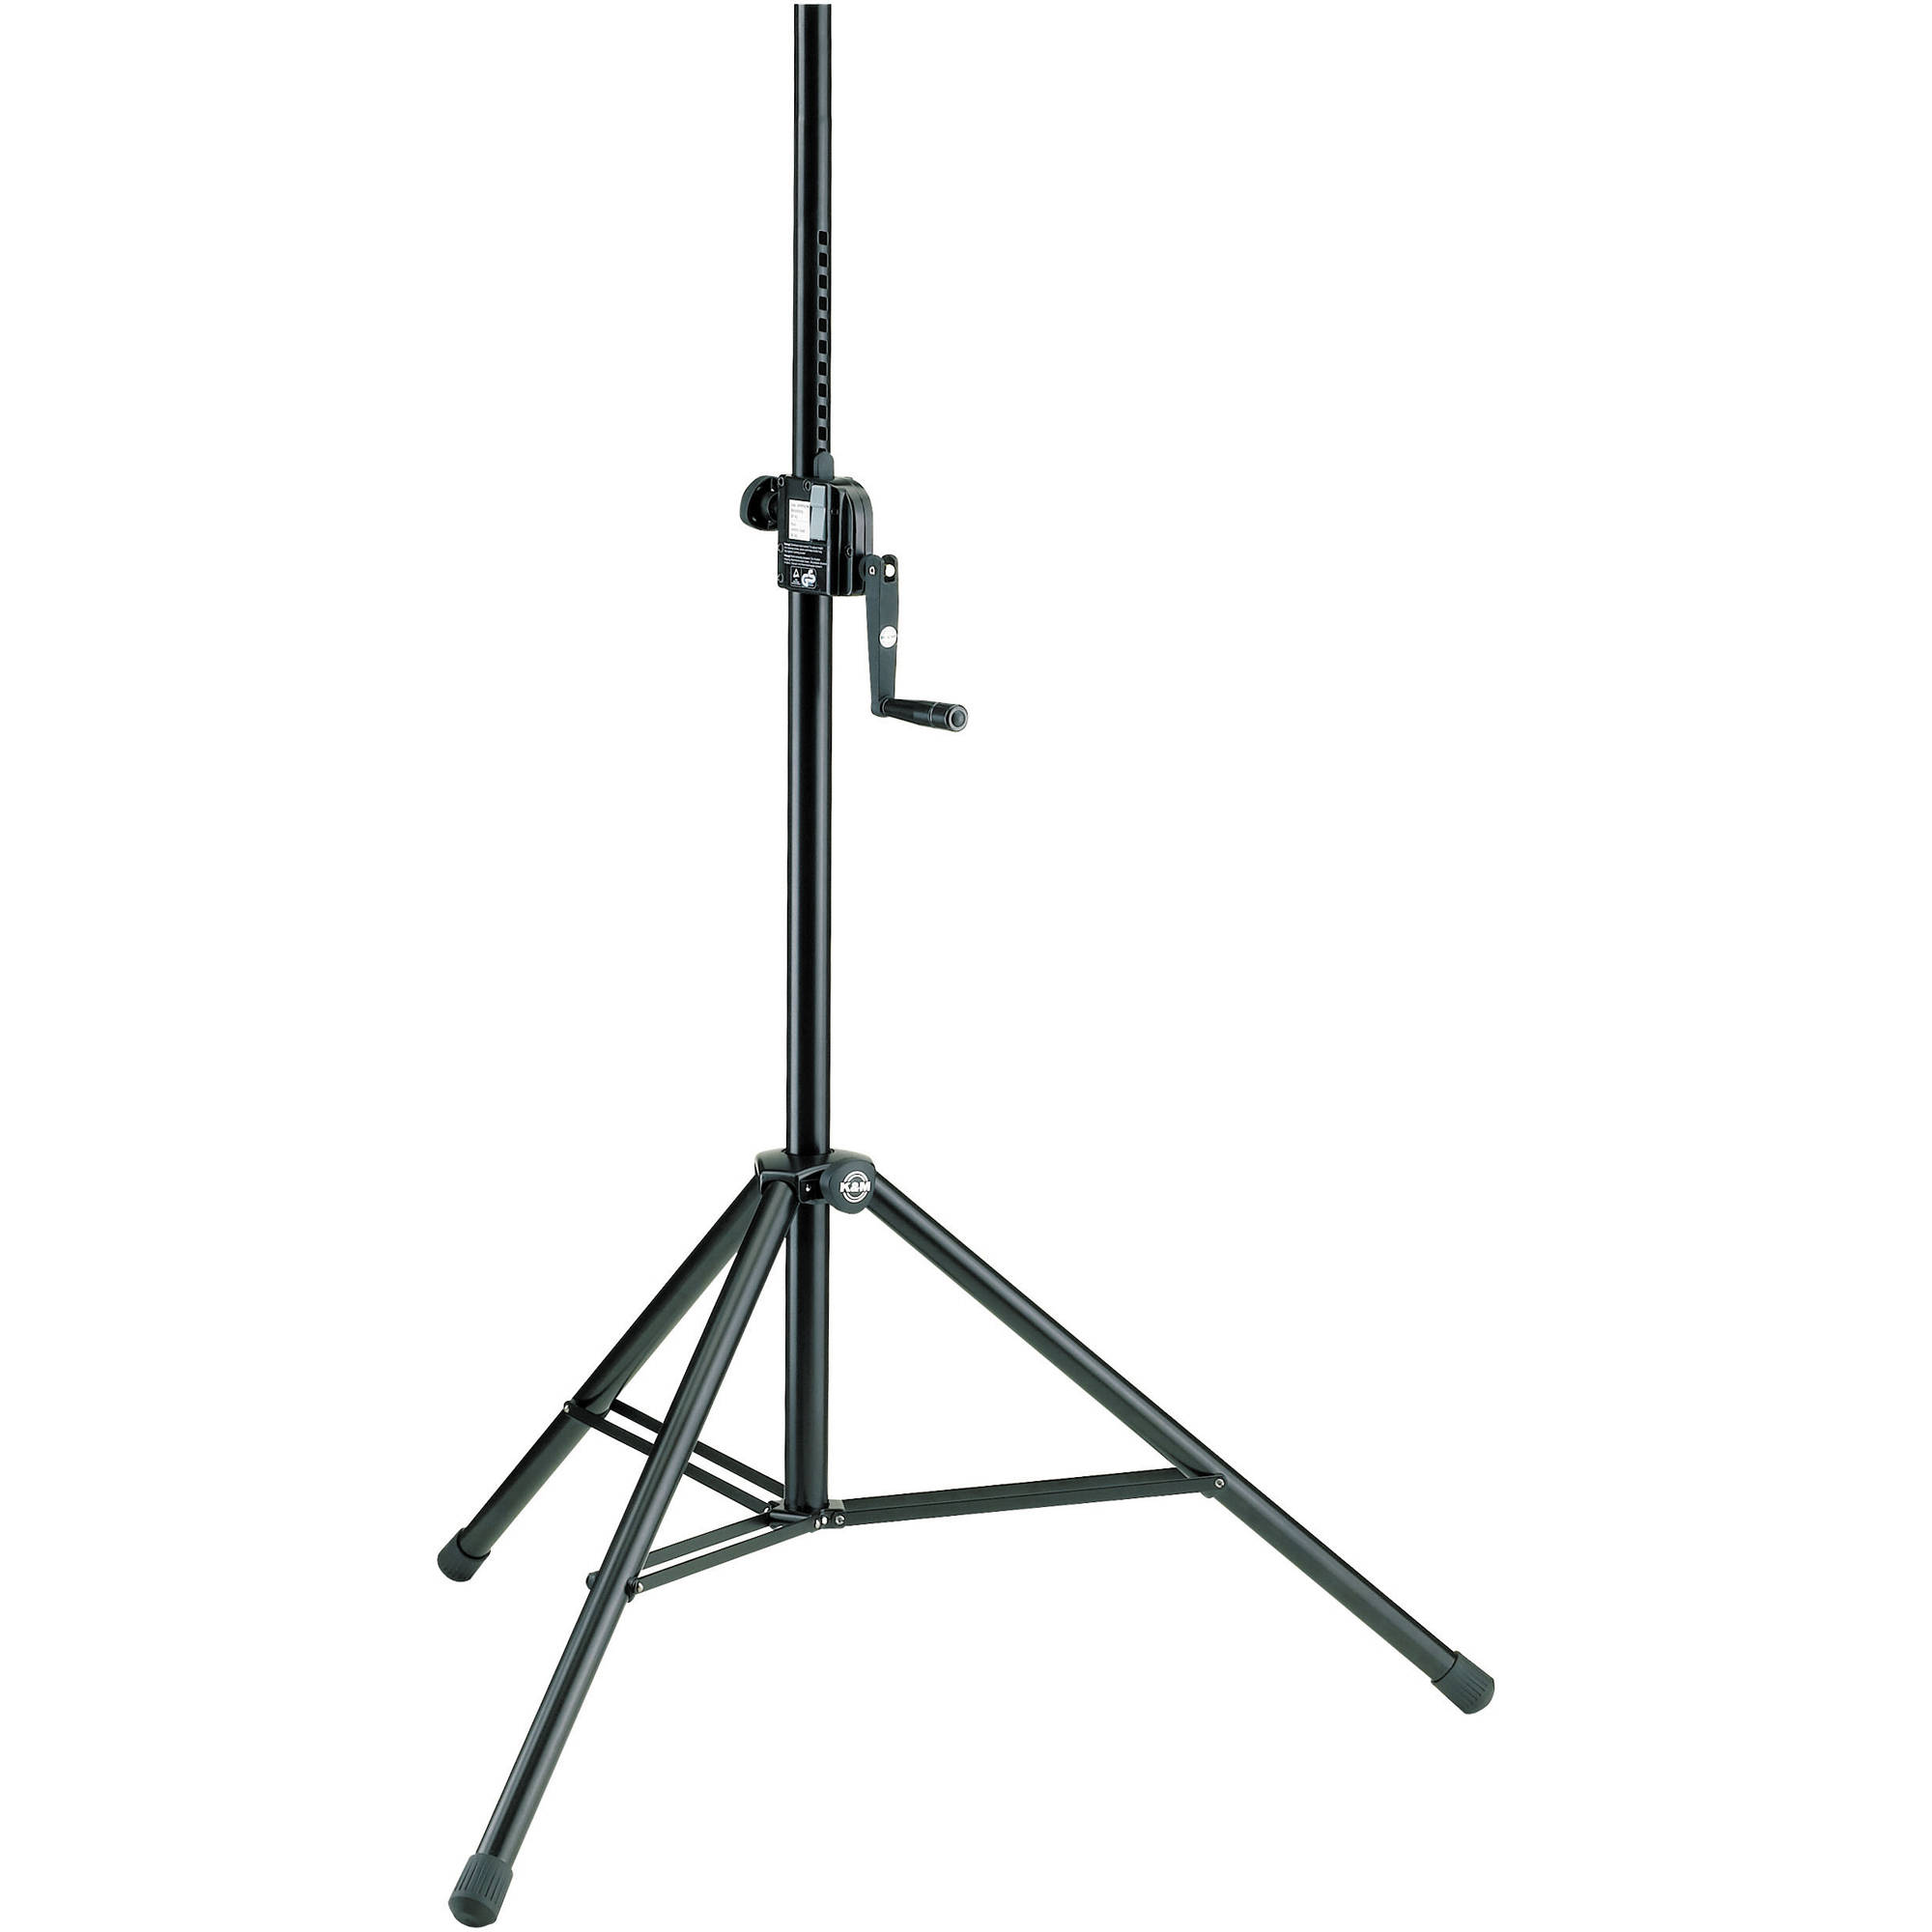 K Amp M 213 Hand Crank Speaker Stand Black 21300 009 55 B Amp H